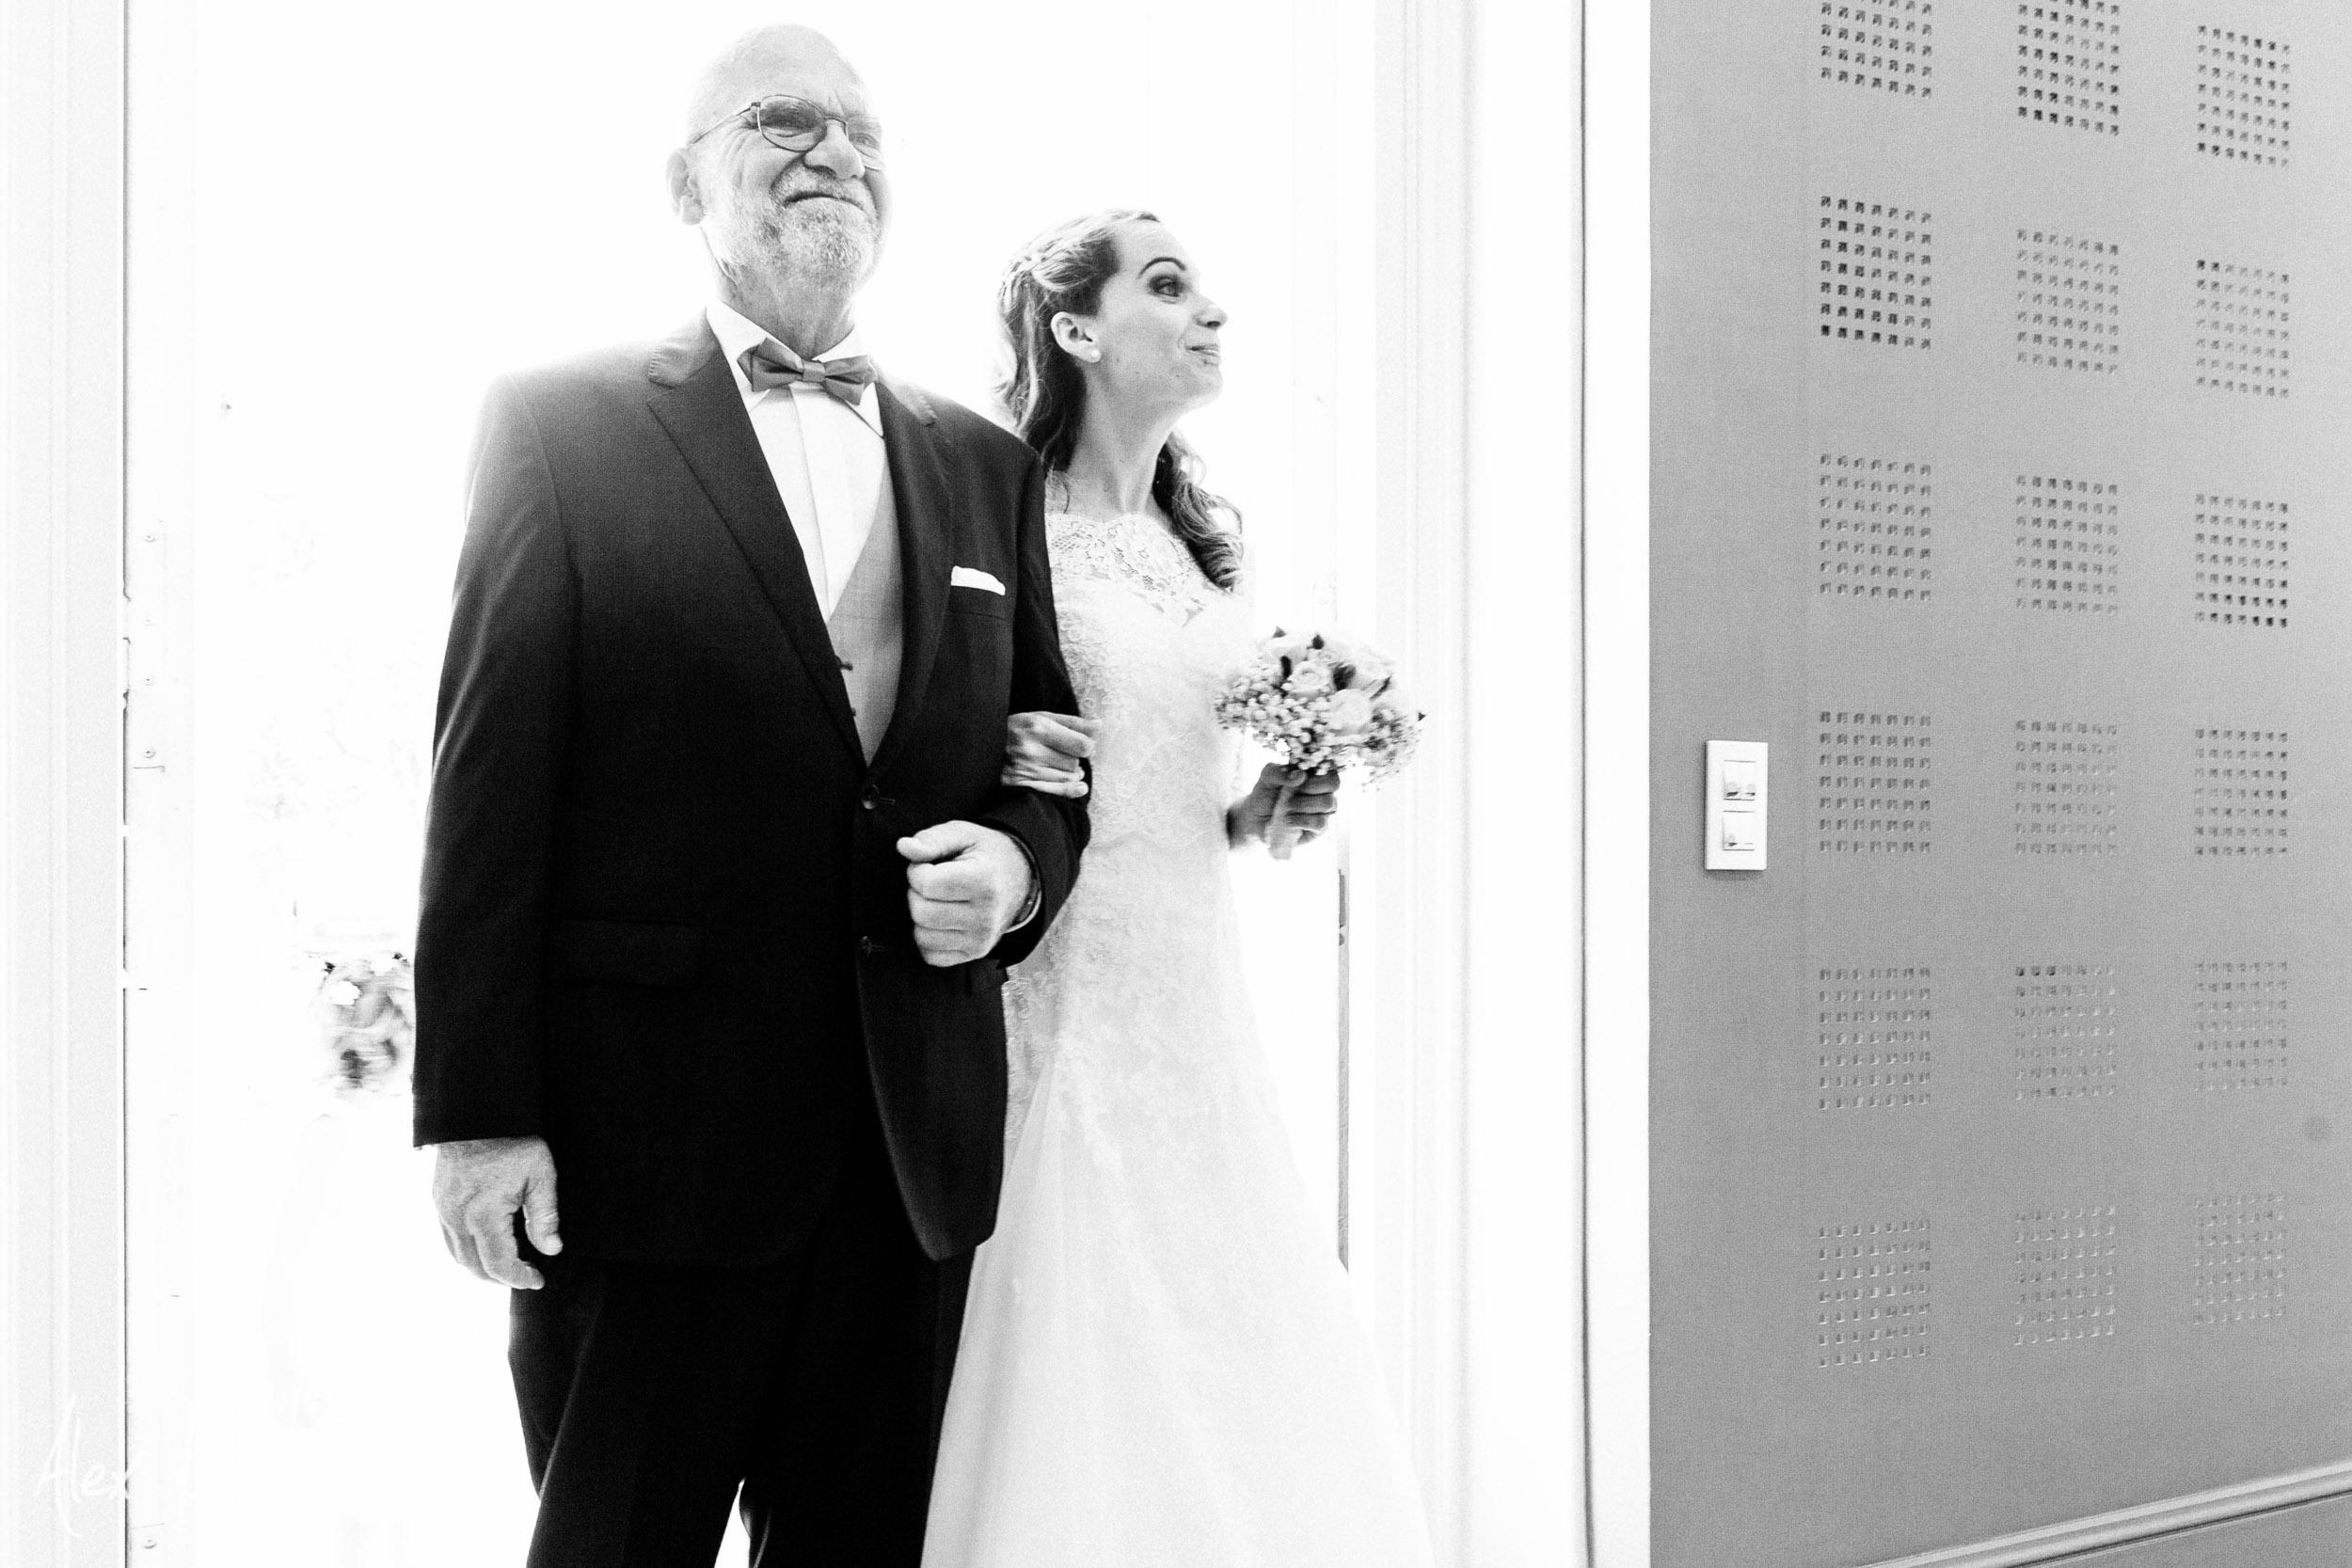 AlexKa_wedding_mariage_photographer-12.jpg